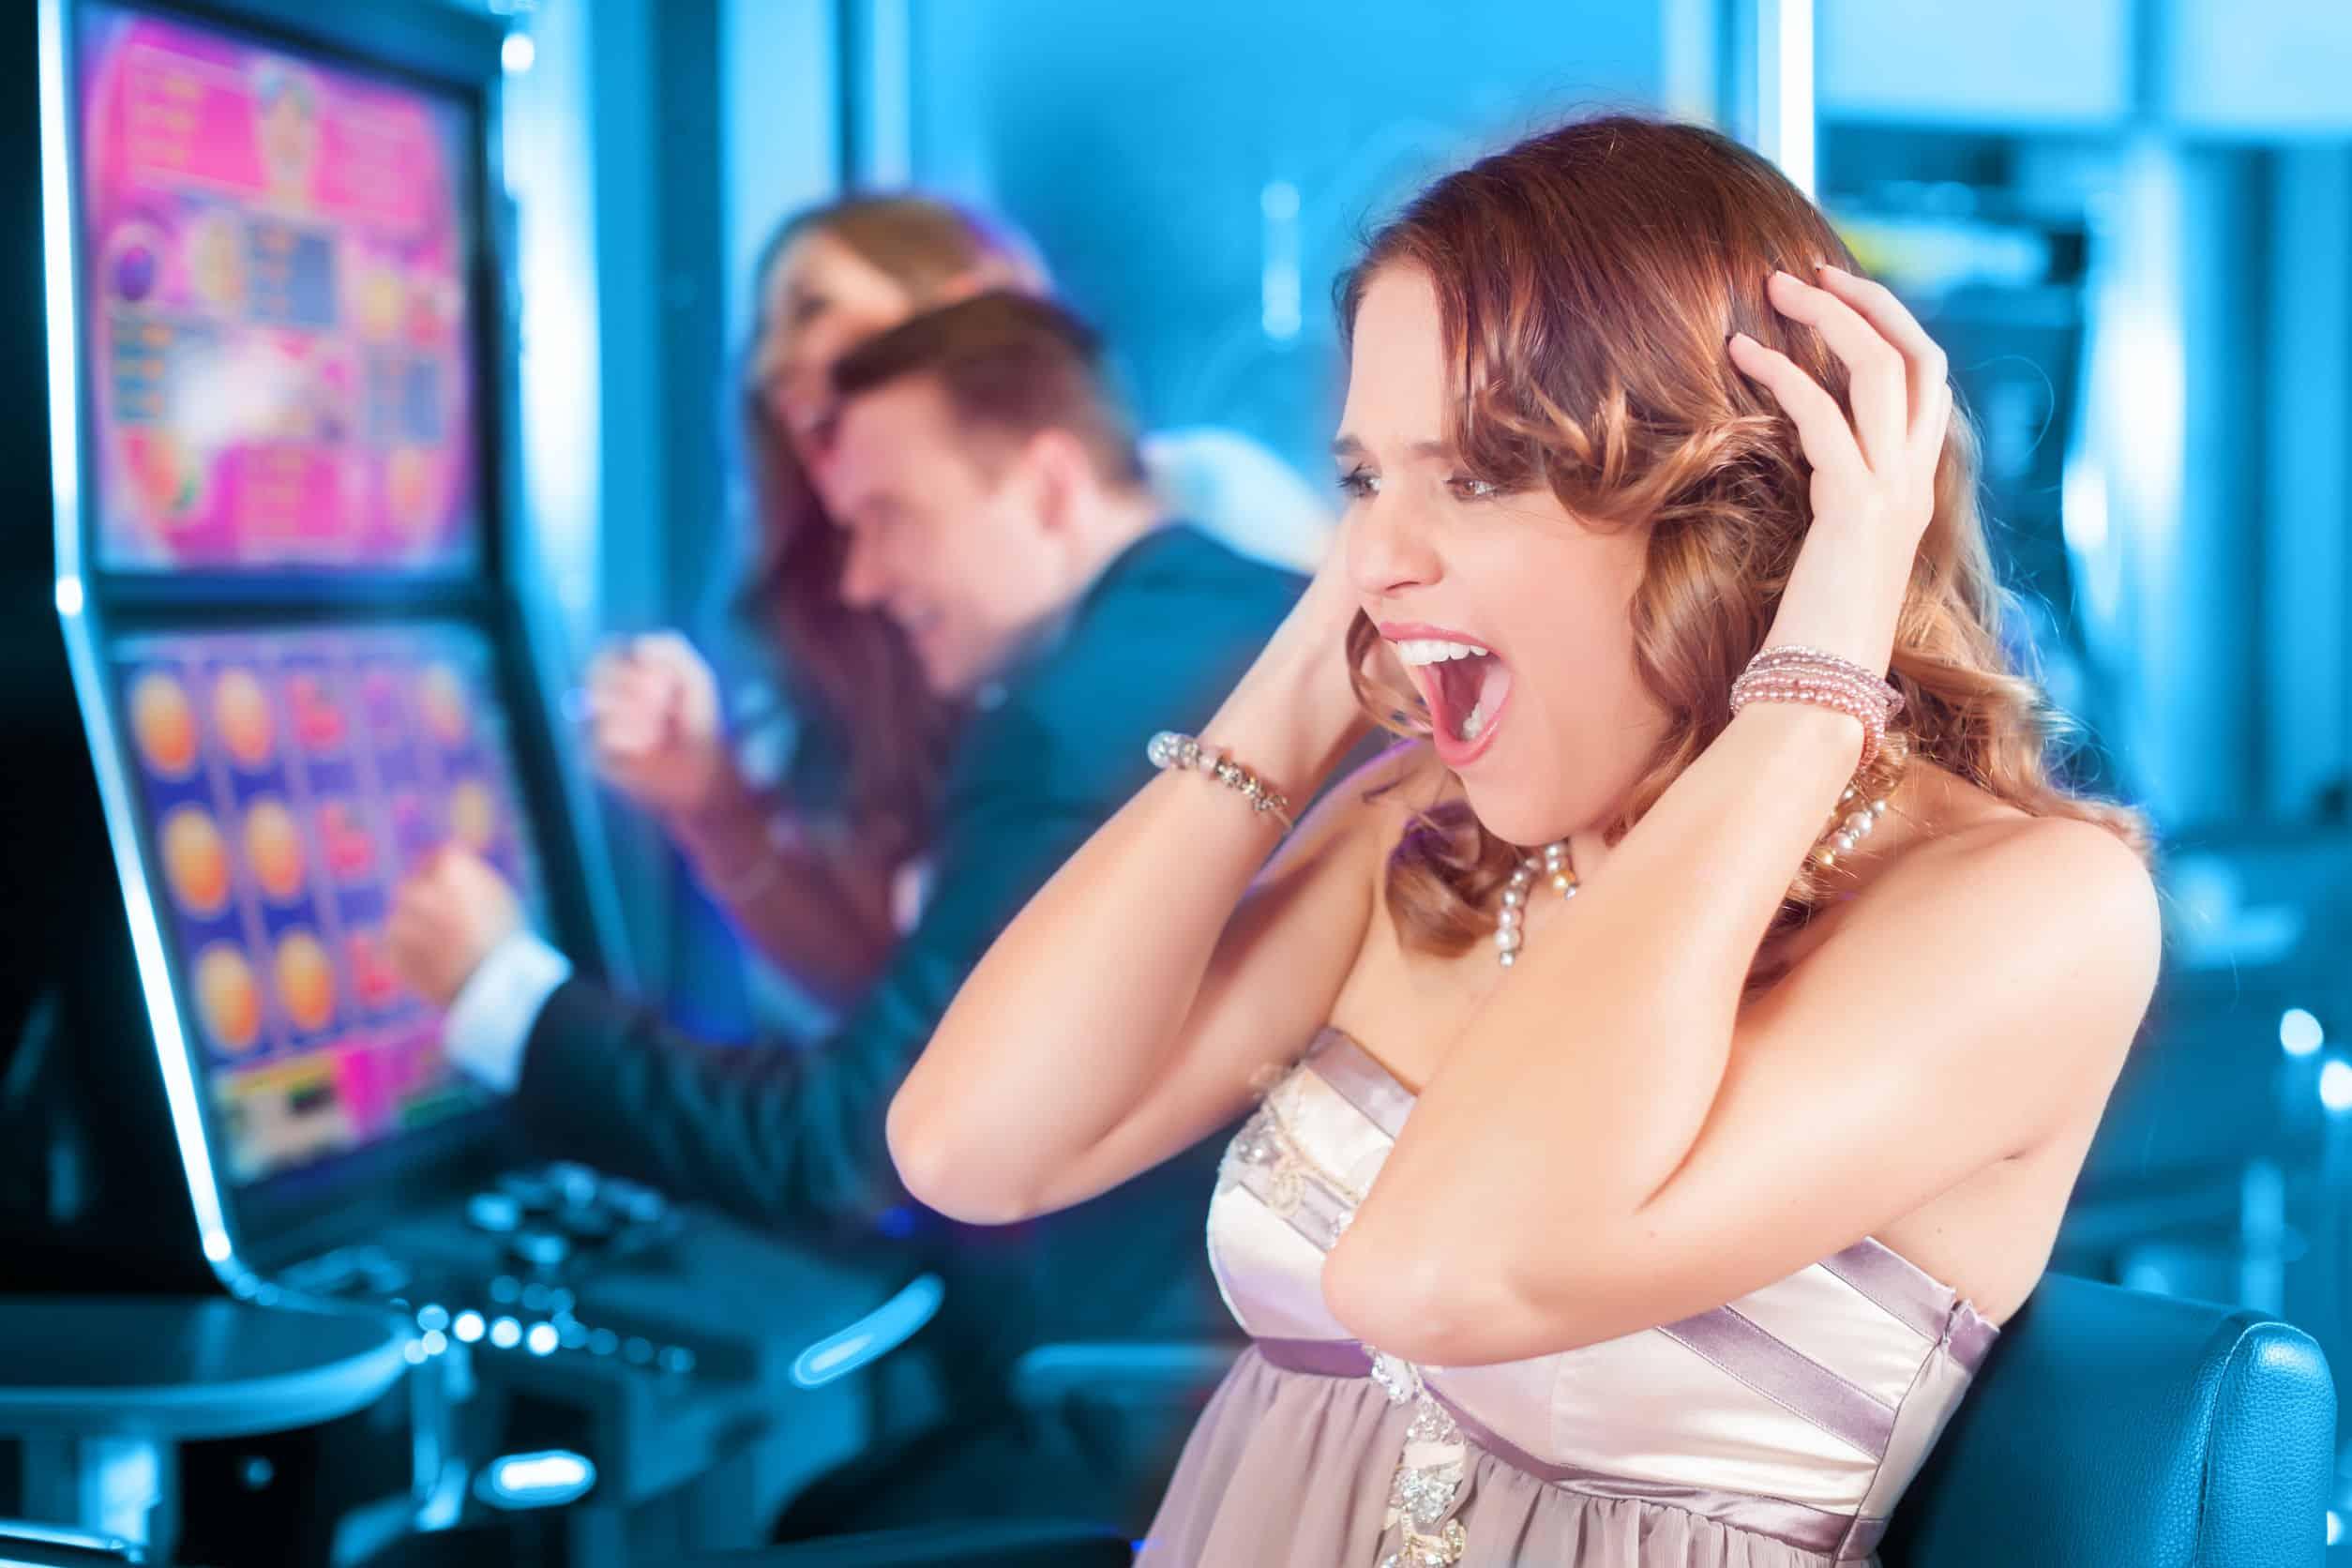 Friends gambling on slot machine